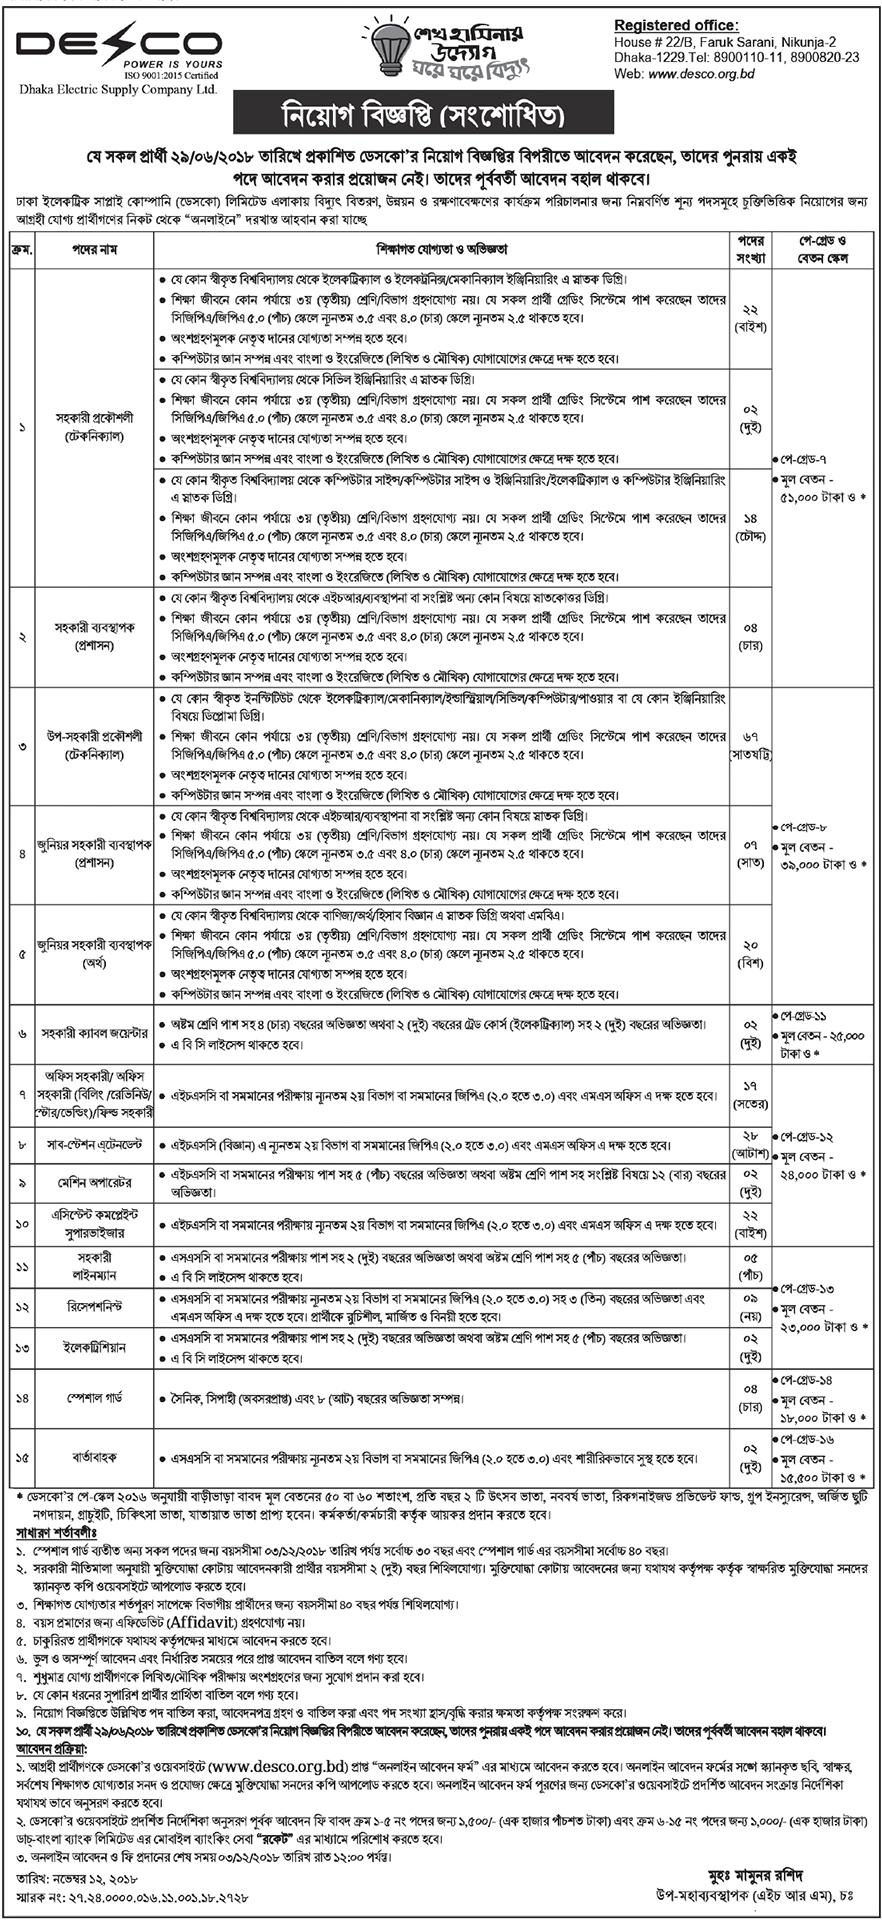 Dhaka Electric Supply Company Limited (DESCO) Job Circular 2018